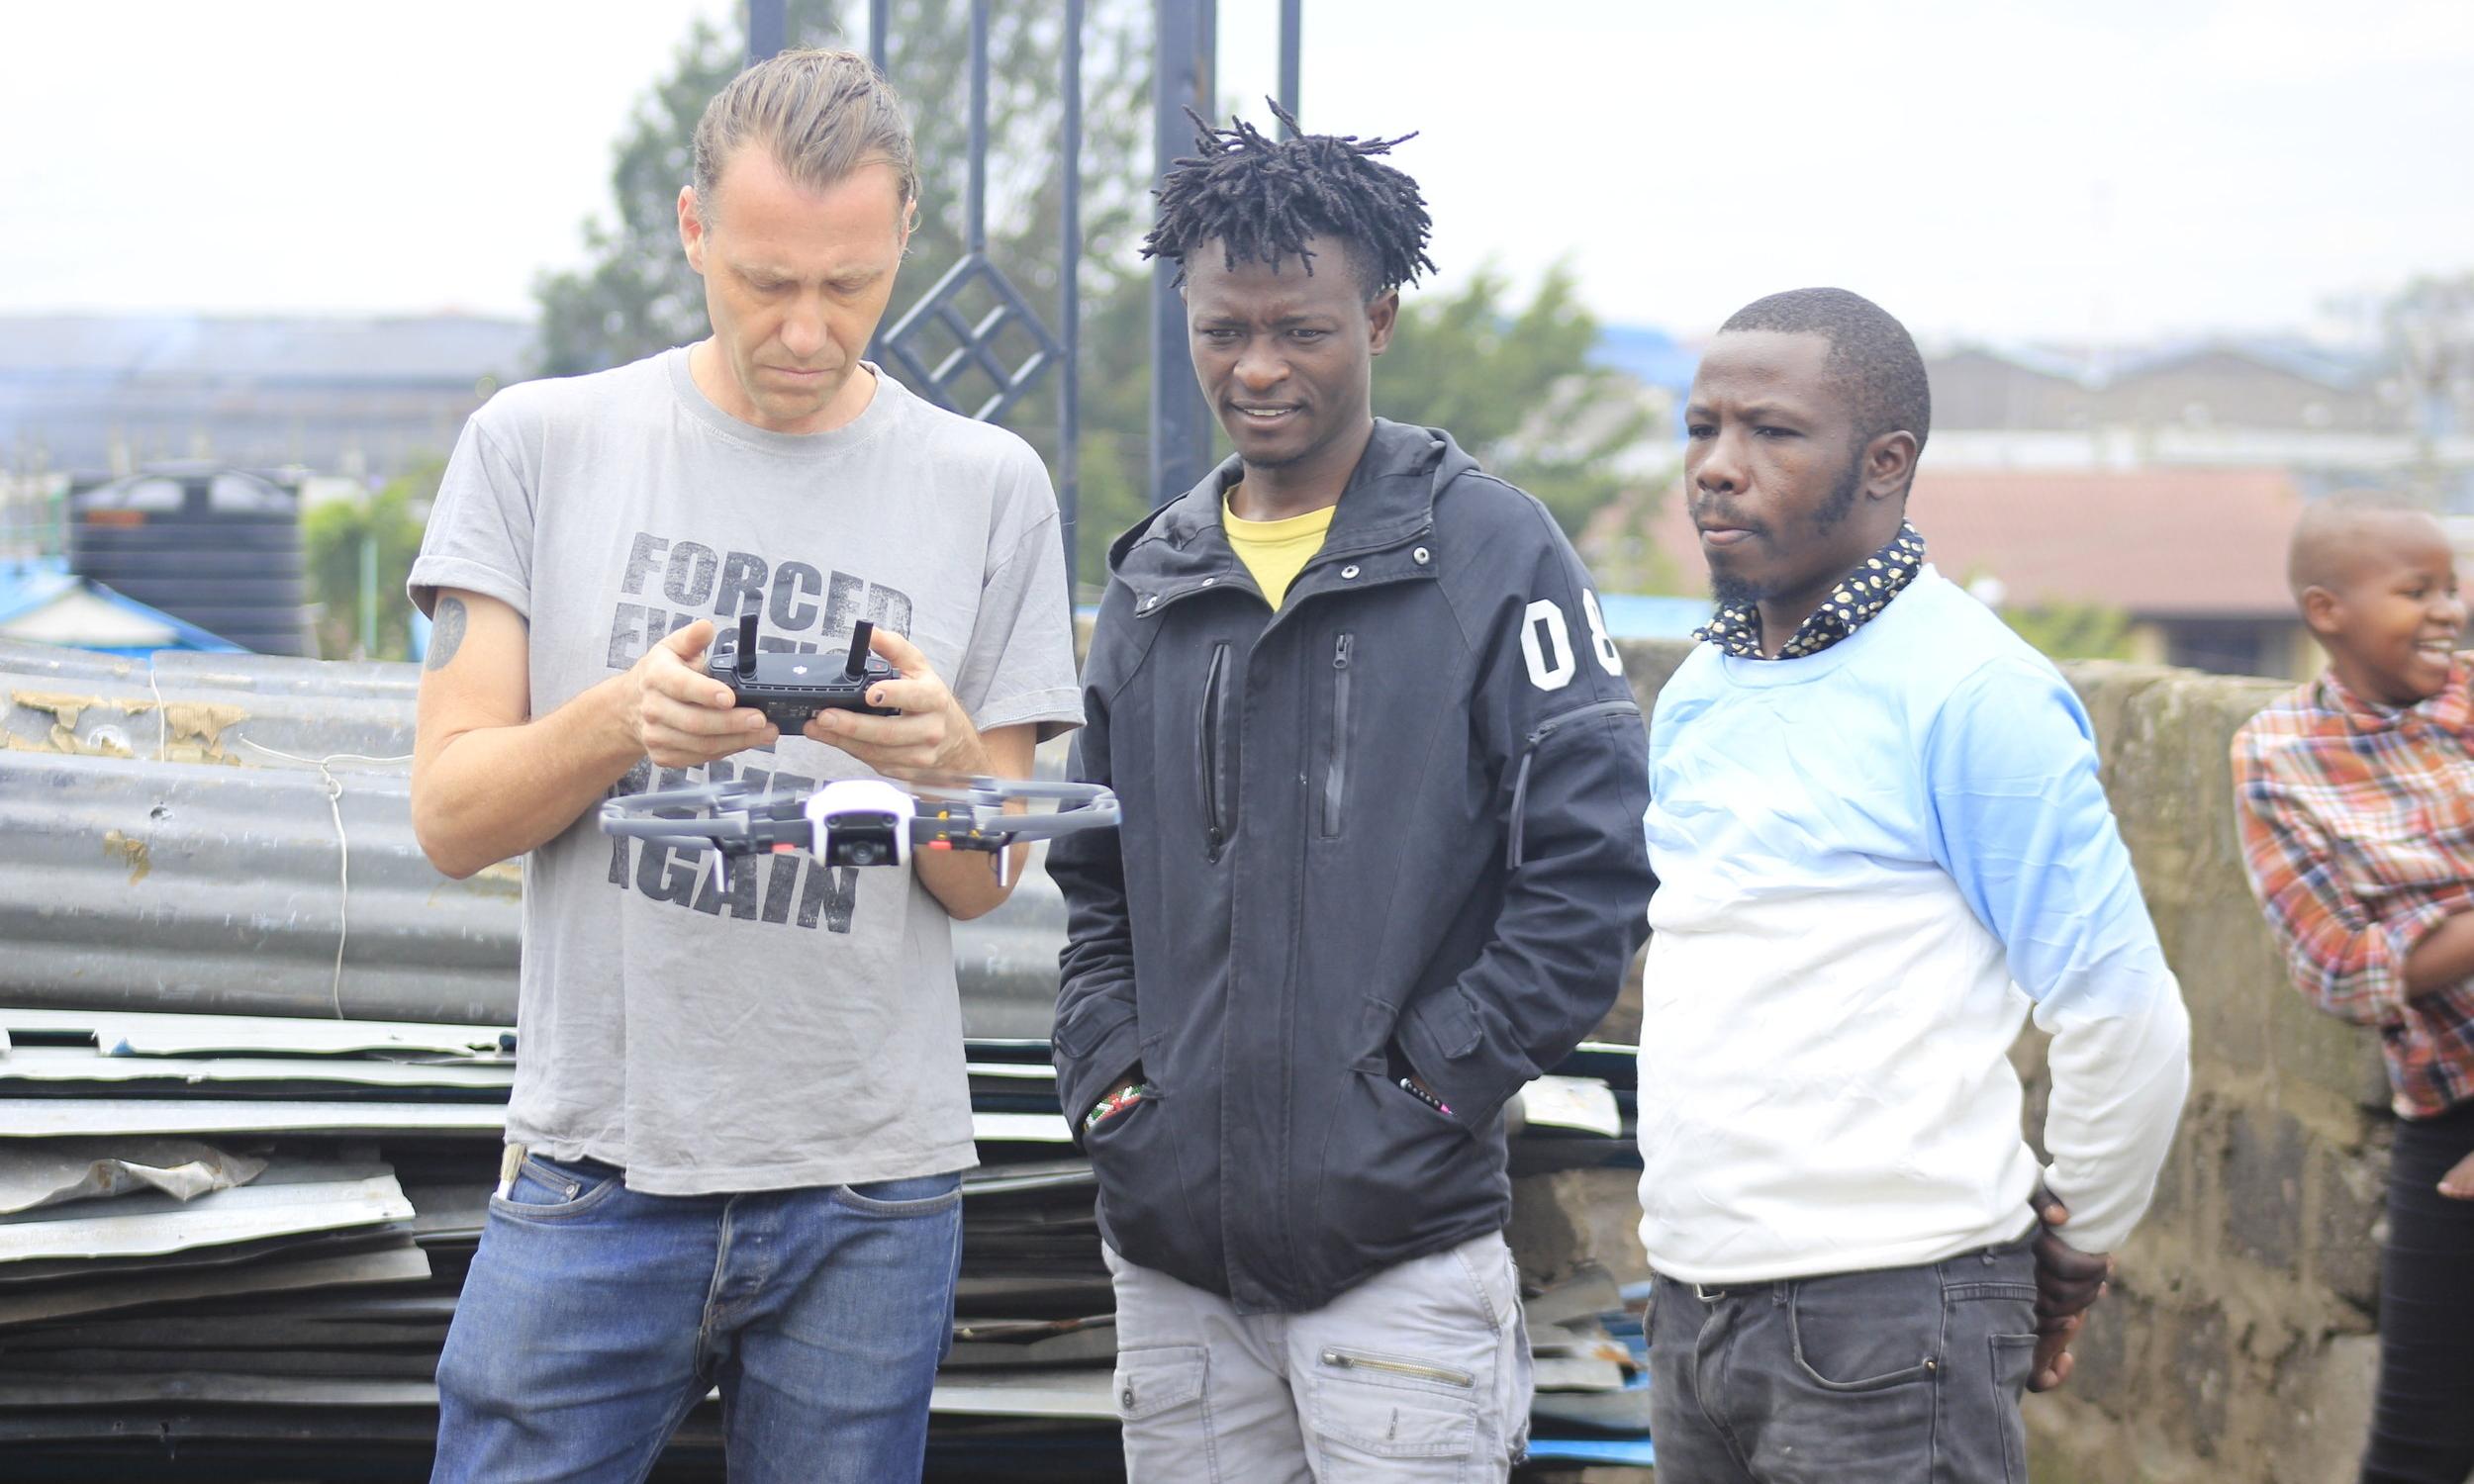 Muungano's KYC.TV team receives practical lessons on using drones in filming from KYC.TV program facilitator James Tayler, in Mukuru, Nairobi.